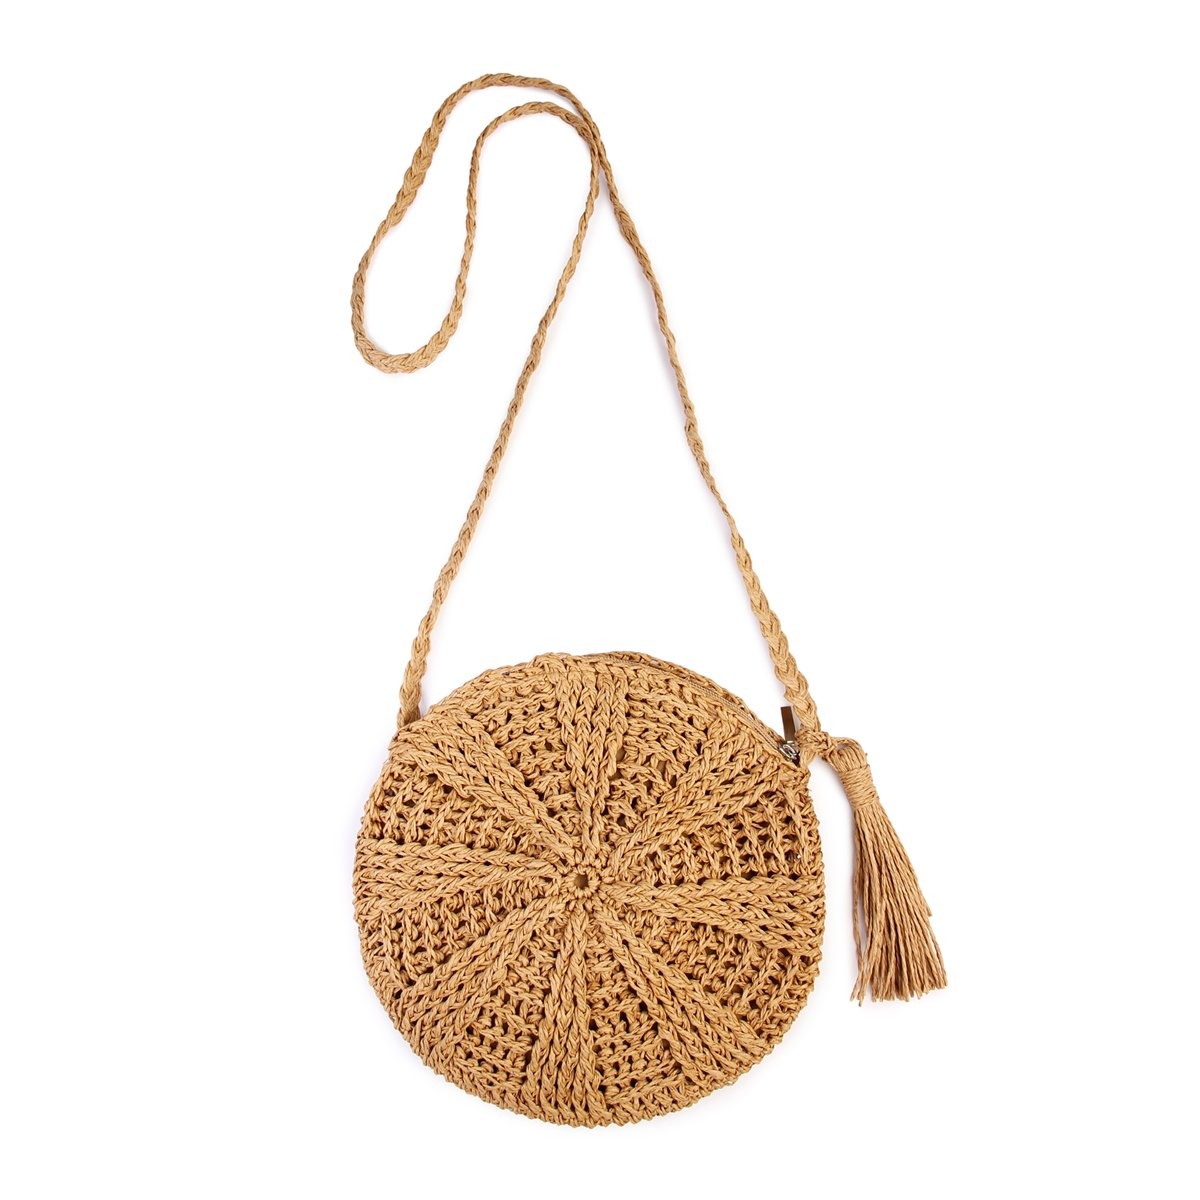 Rattan Crochet Straw Woven Basket Bali Handbag Round Circle Crossbody Shopper Beach Tote BagRattan Crochet Straw Woven Basket Bali Handbag Round Circle Crossbody Shopper Beach Tote Bag